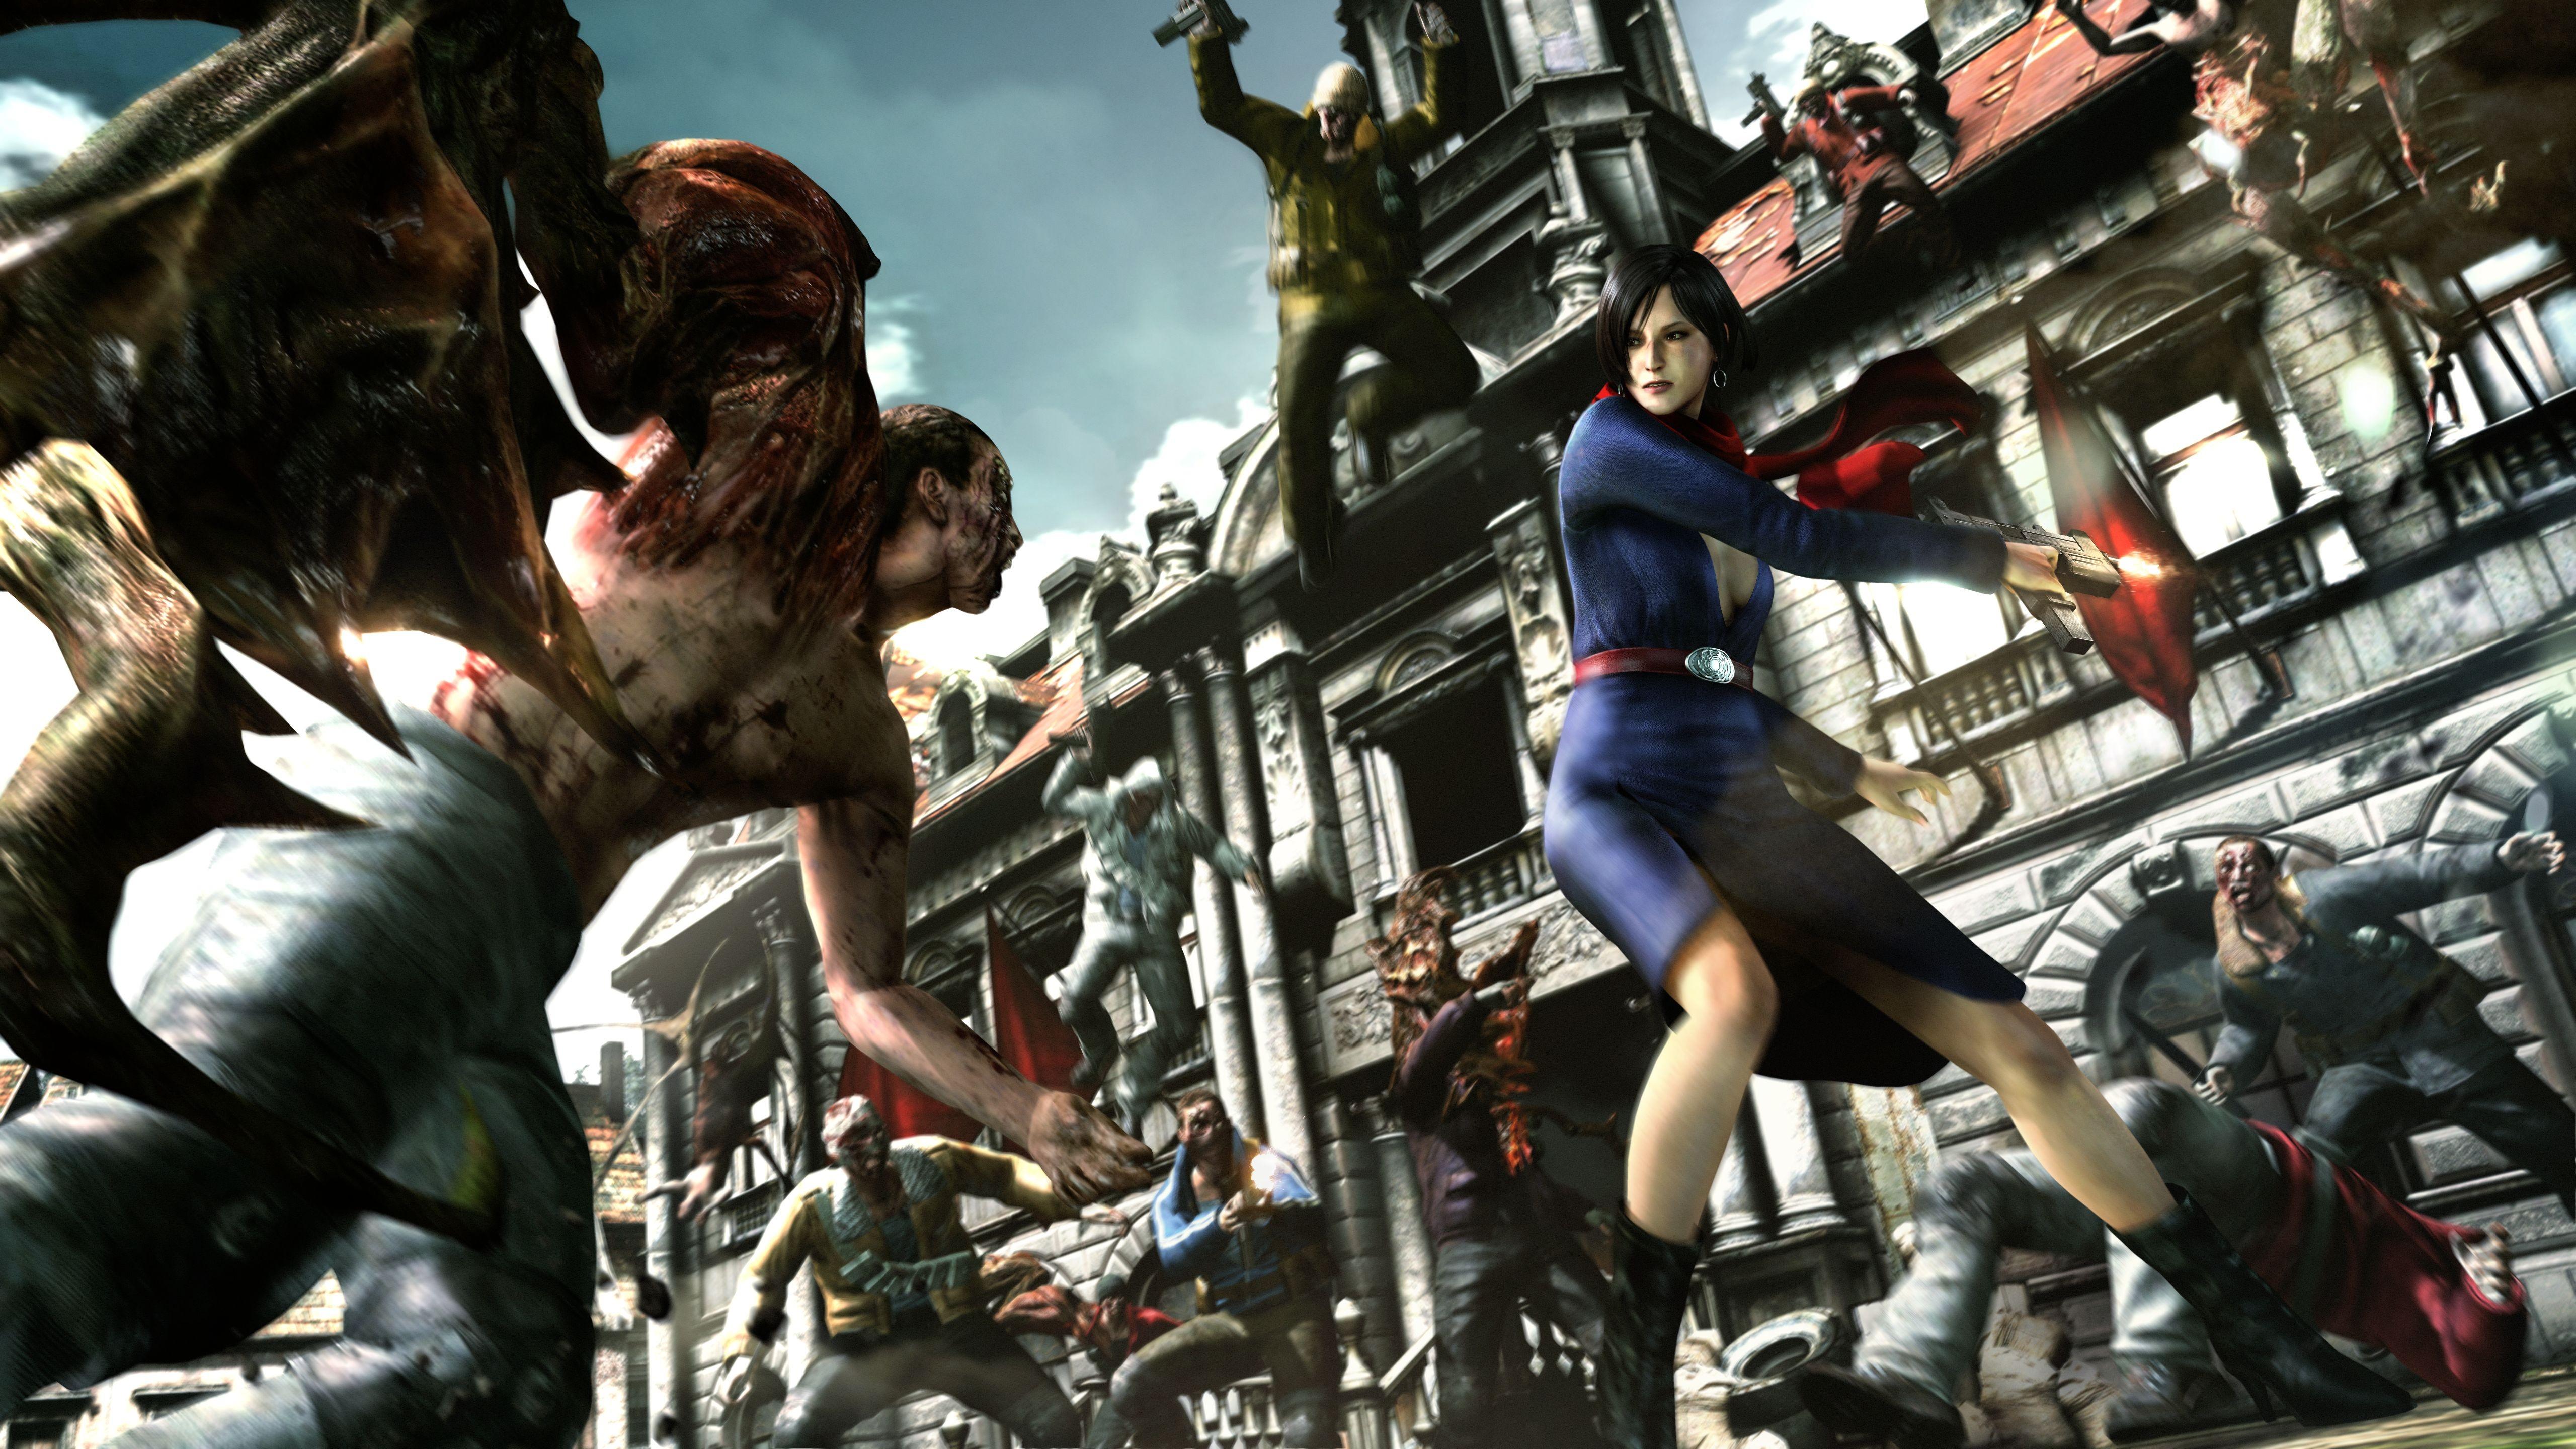 Wallpaper Comics Zombies Resident Evil 6 Ada Wong Carla